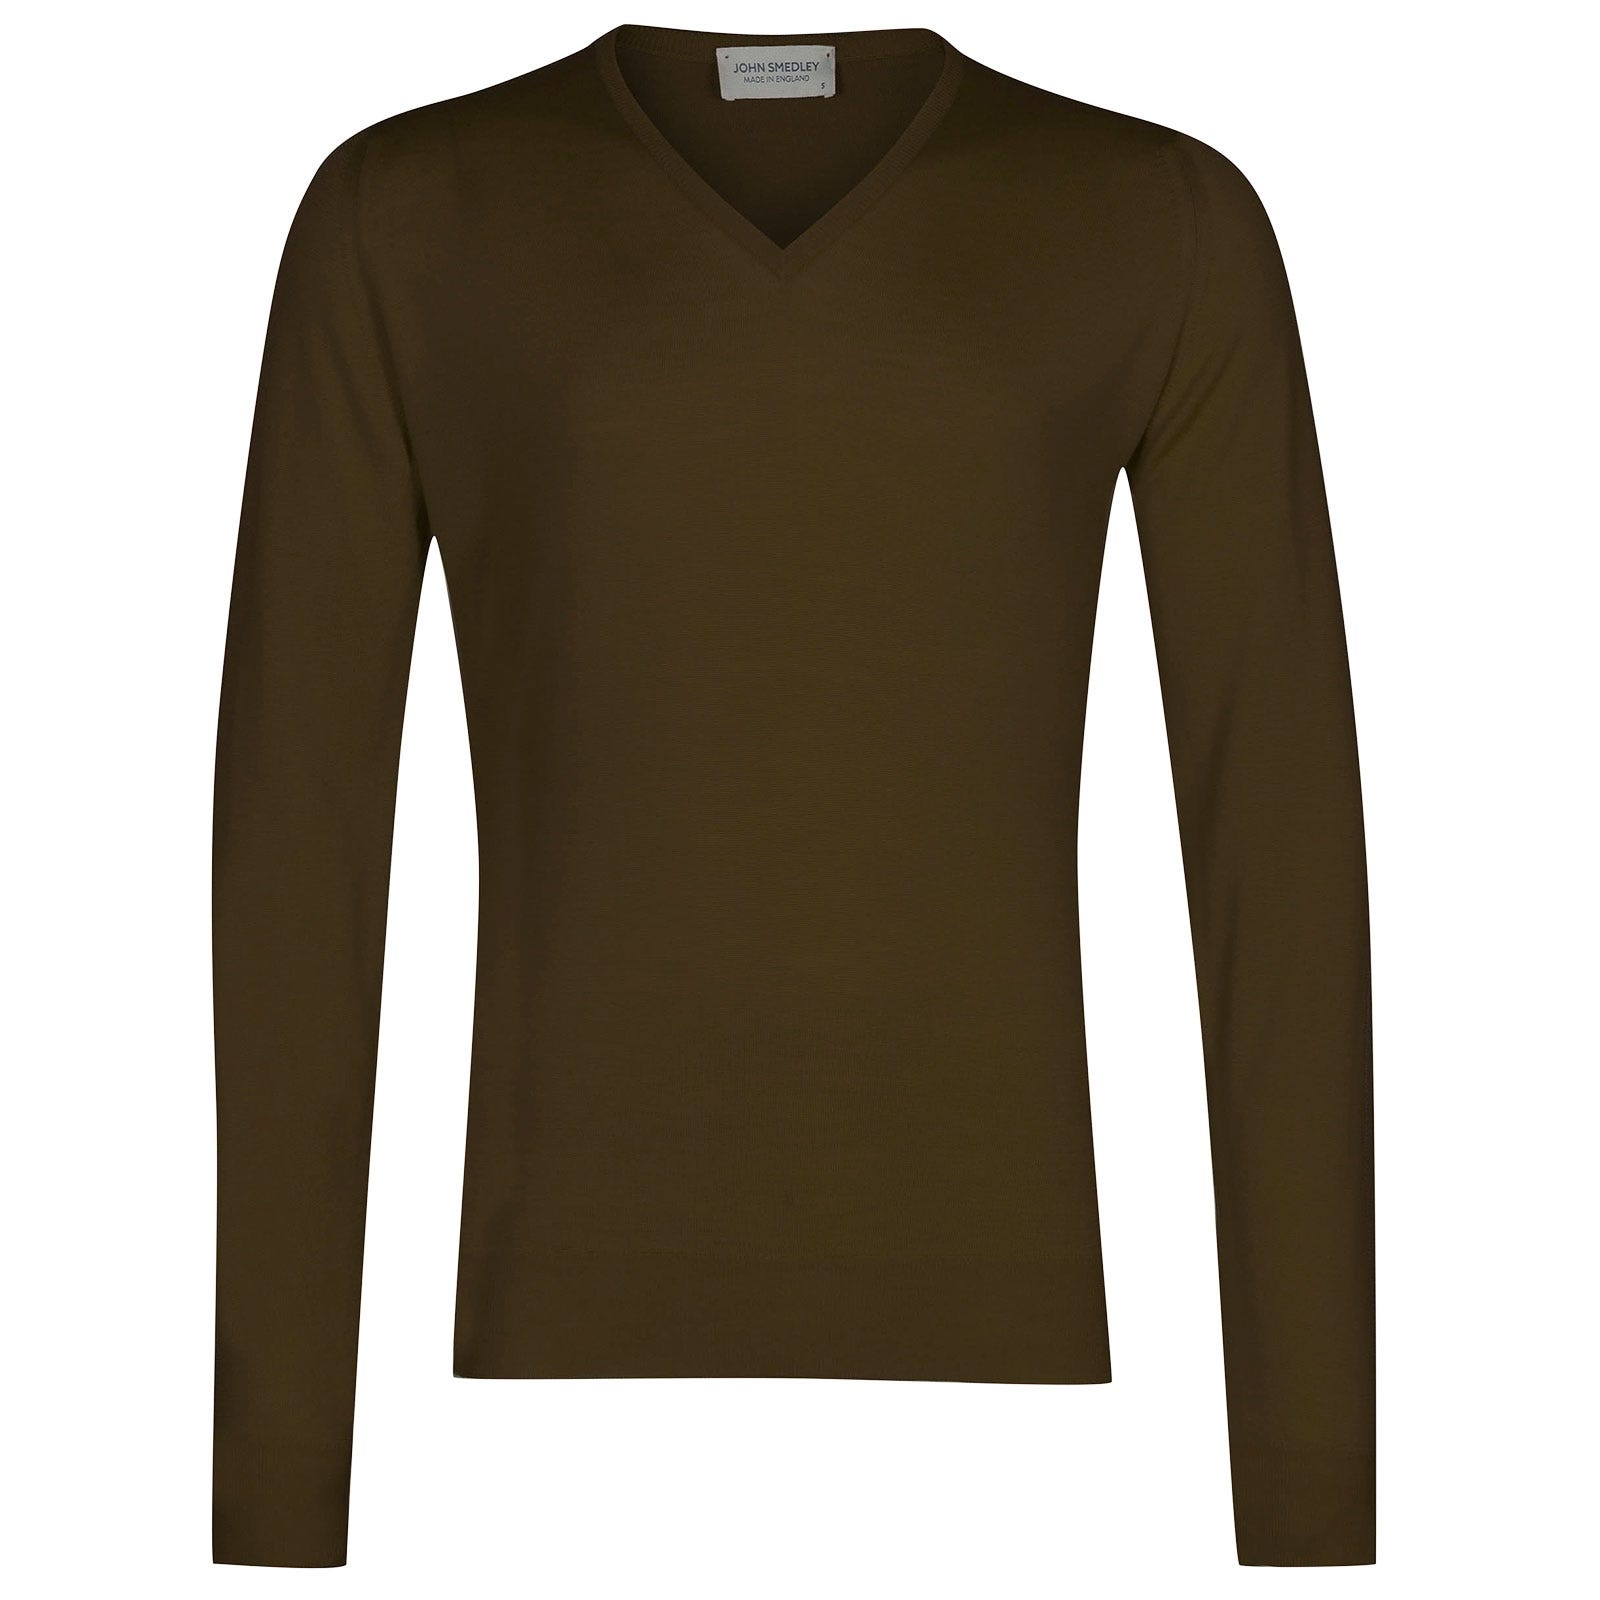 John Smedley Blenheim Merino Wool Pullover in Khaki-XXL